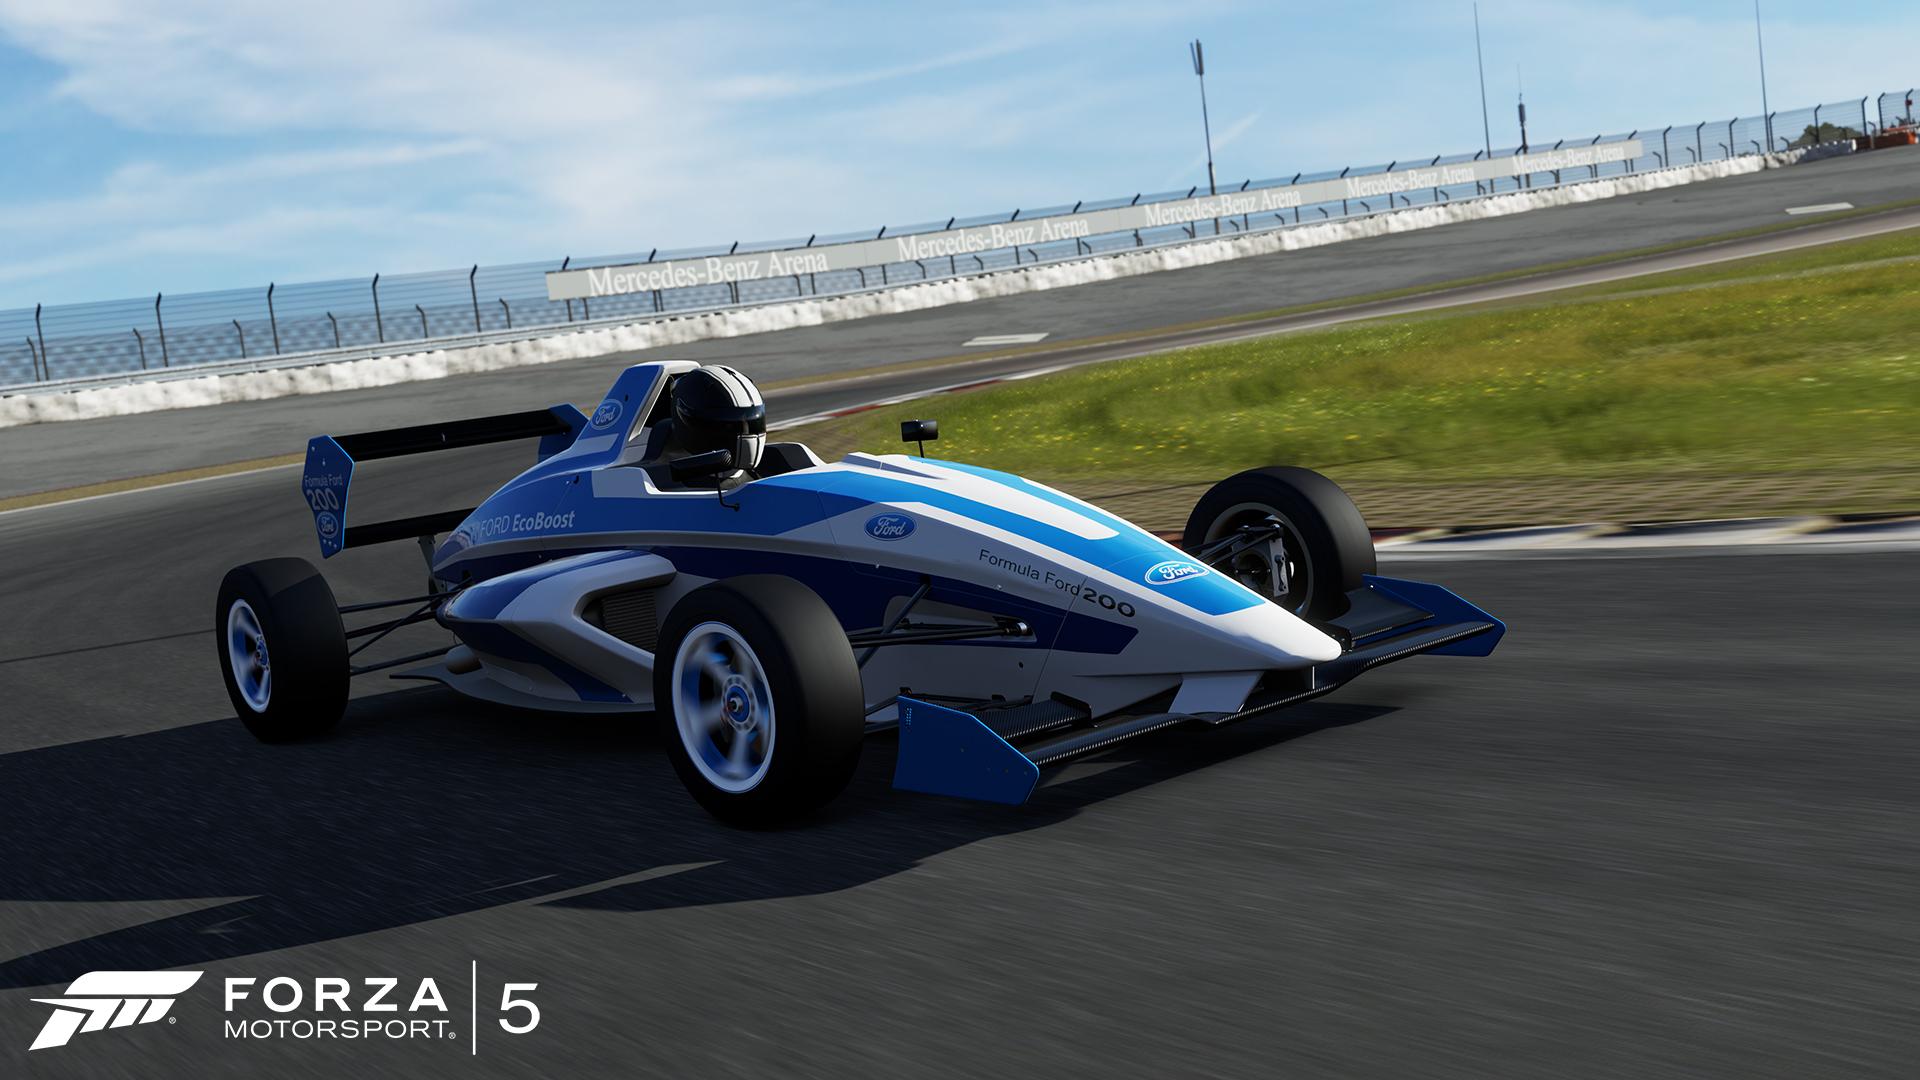 Ford Formula Ecoboost 200 Forza Motorsport Wiki Fandom Powered